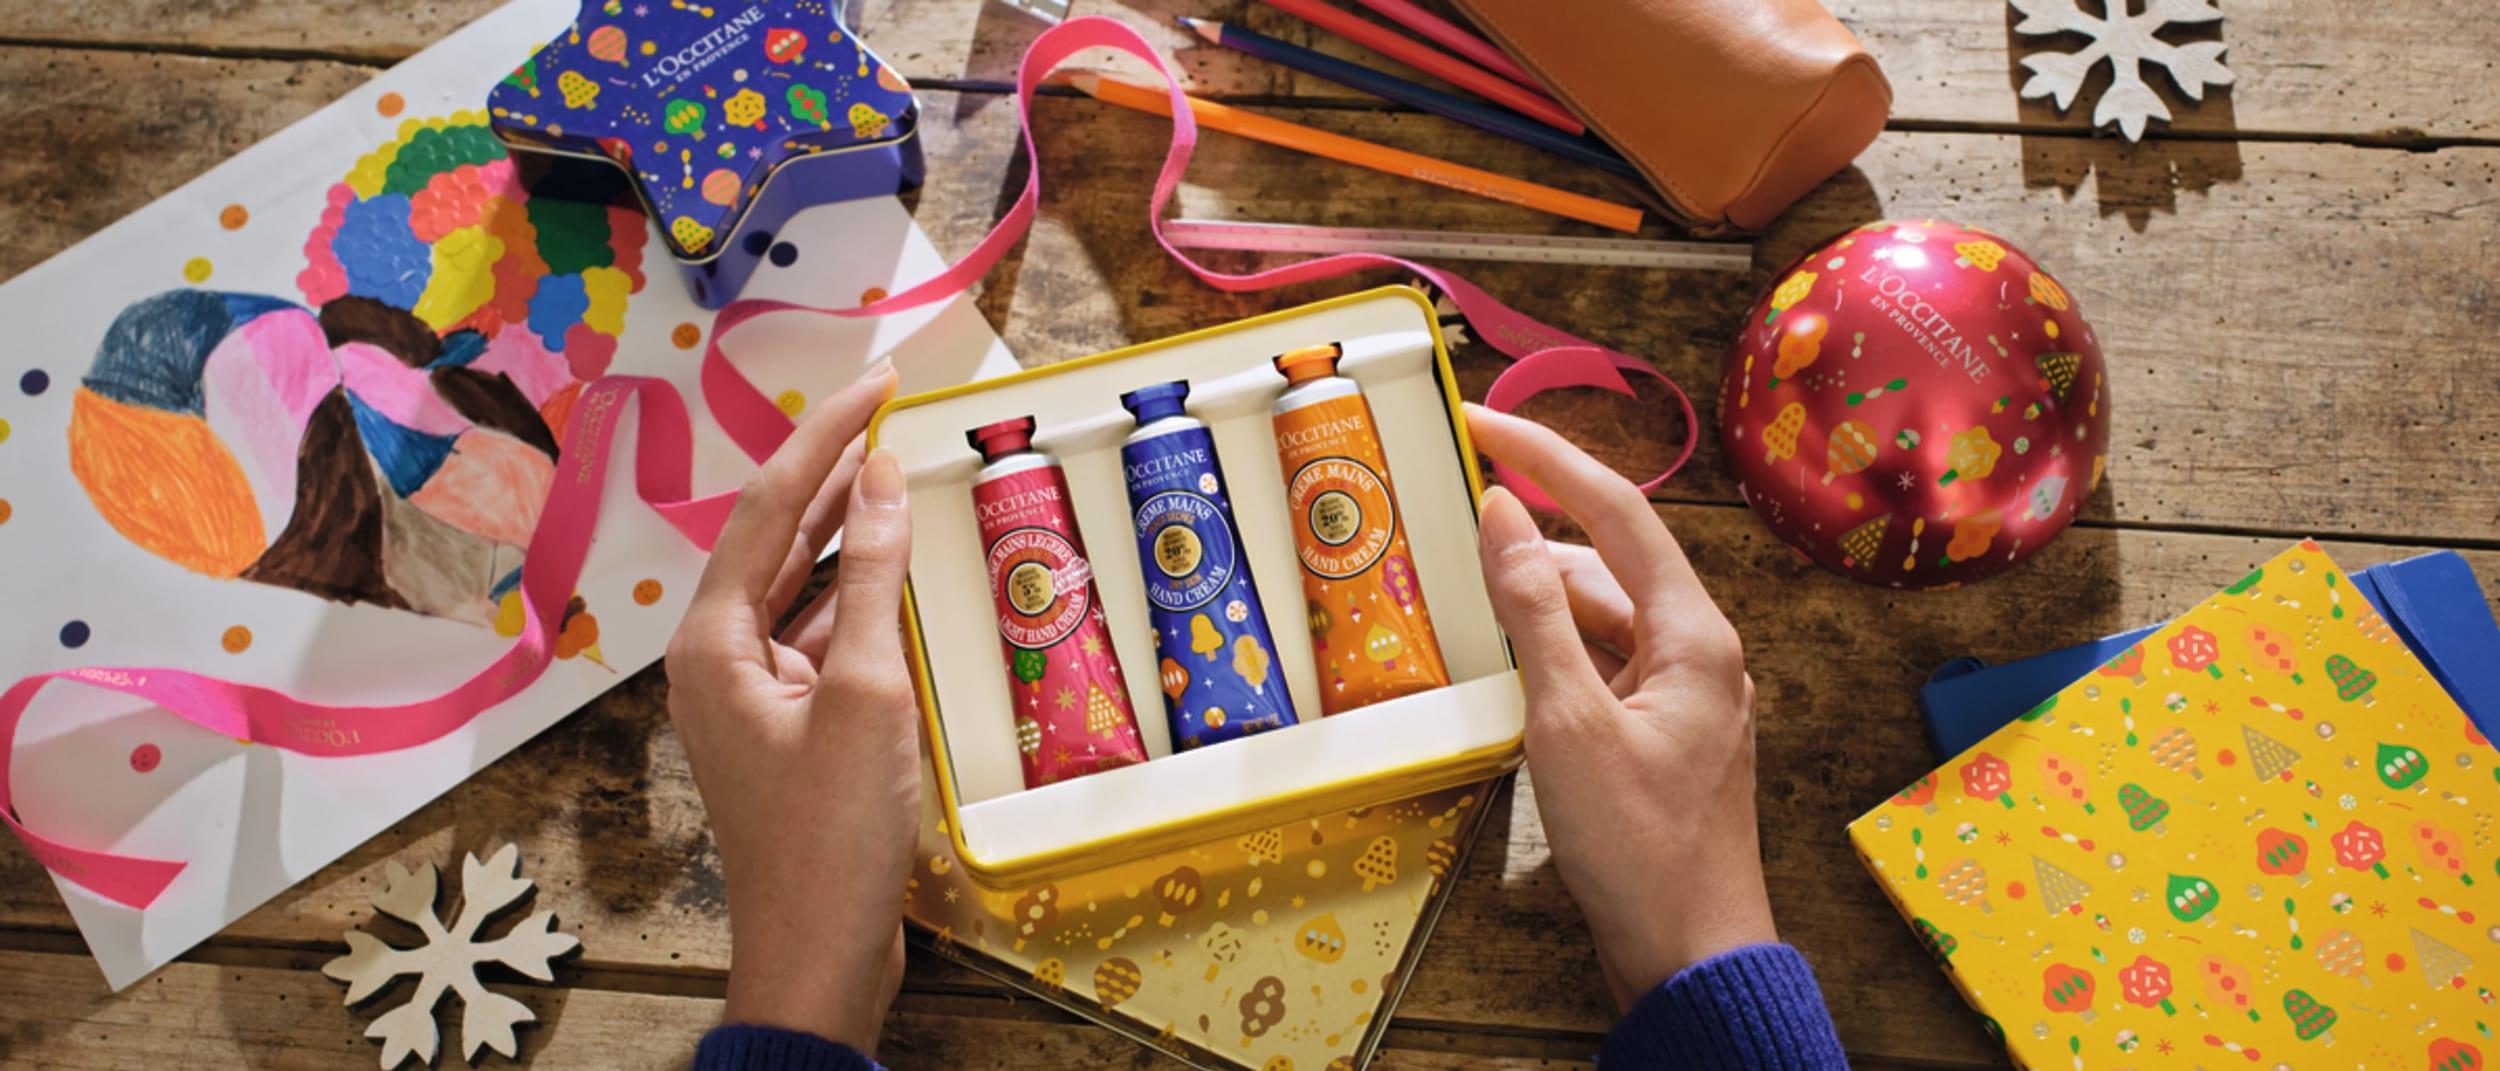 L'OCCITANE: The art of gifting workshop